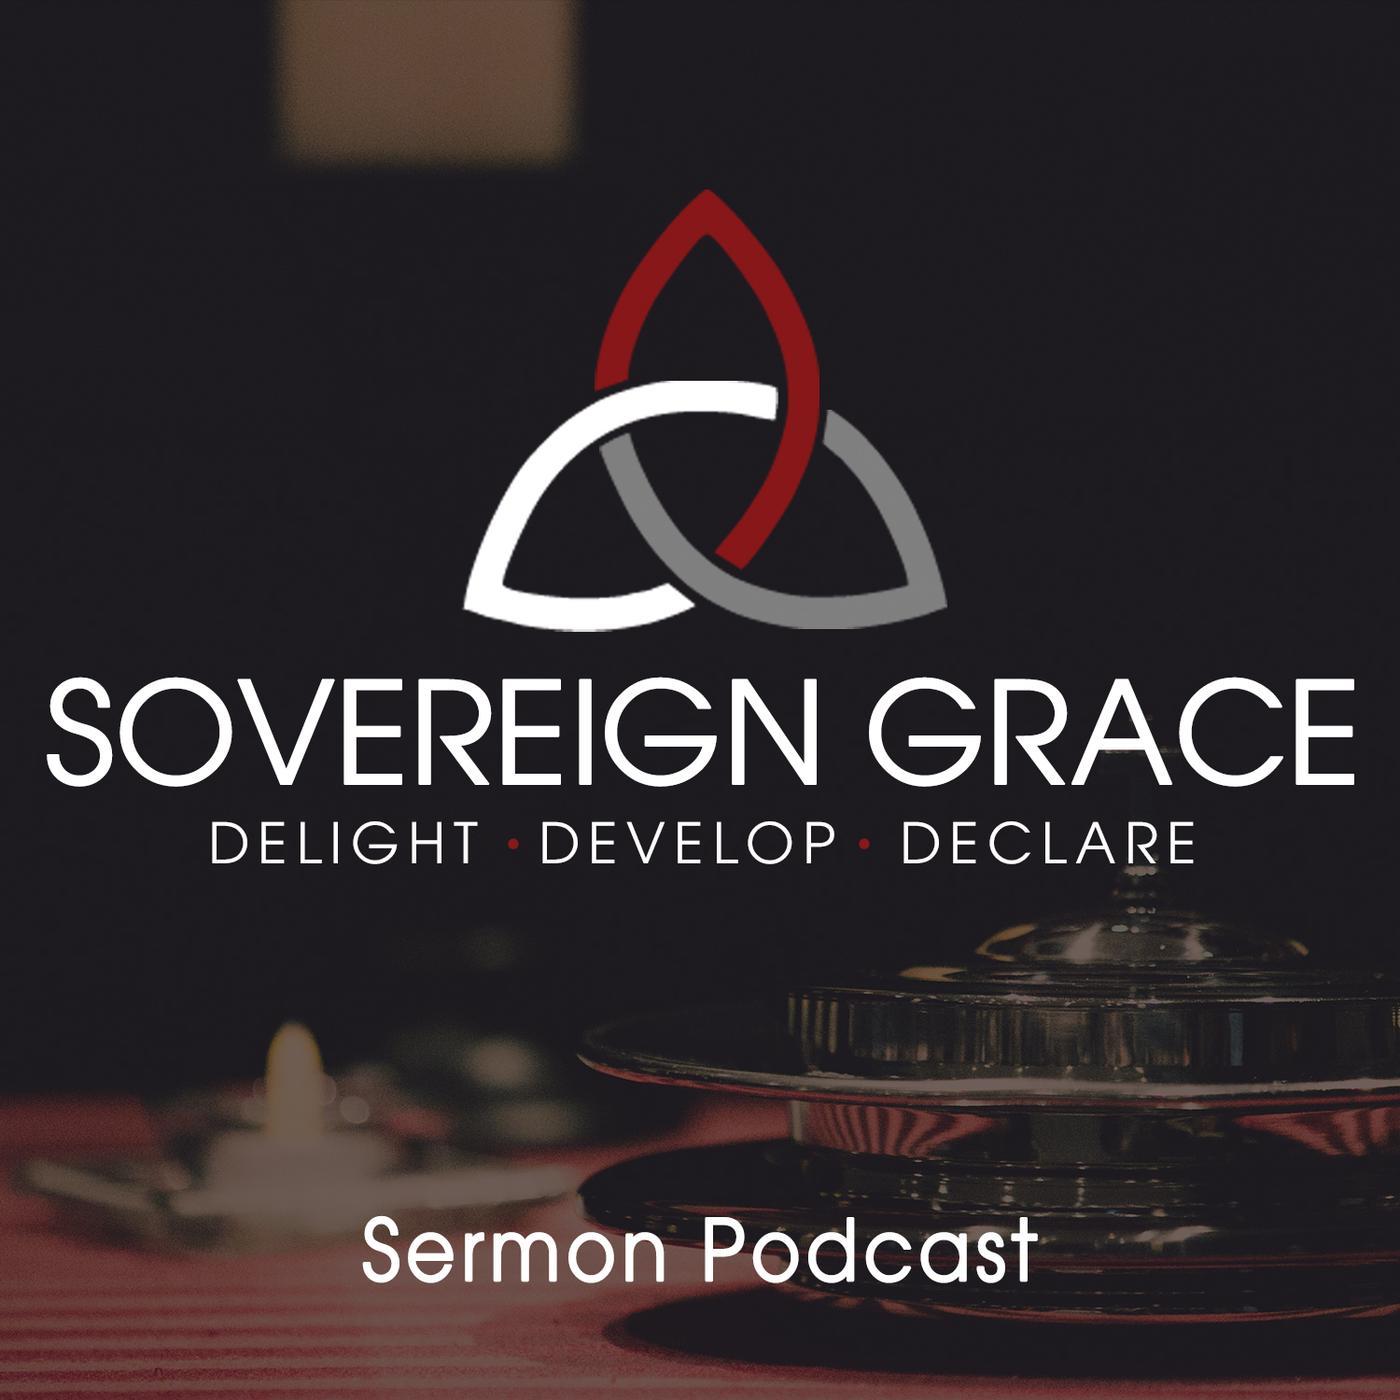 Sovereign Grace Church Sermons (podcast) - Sovereign Grace